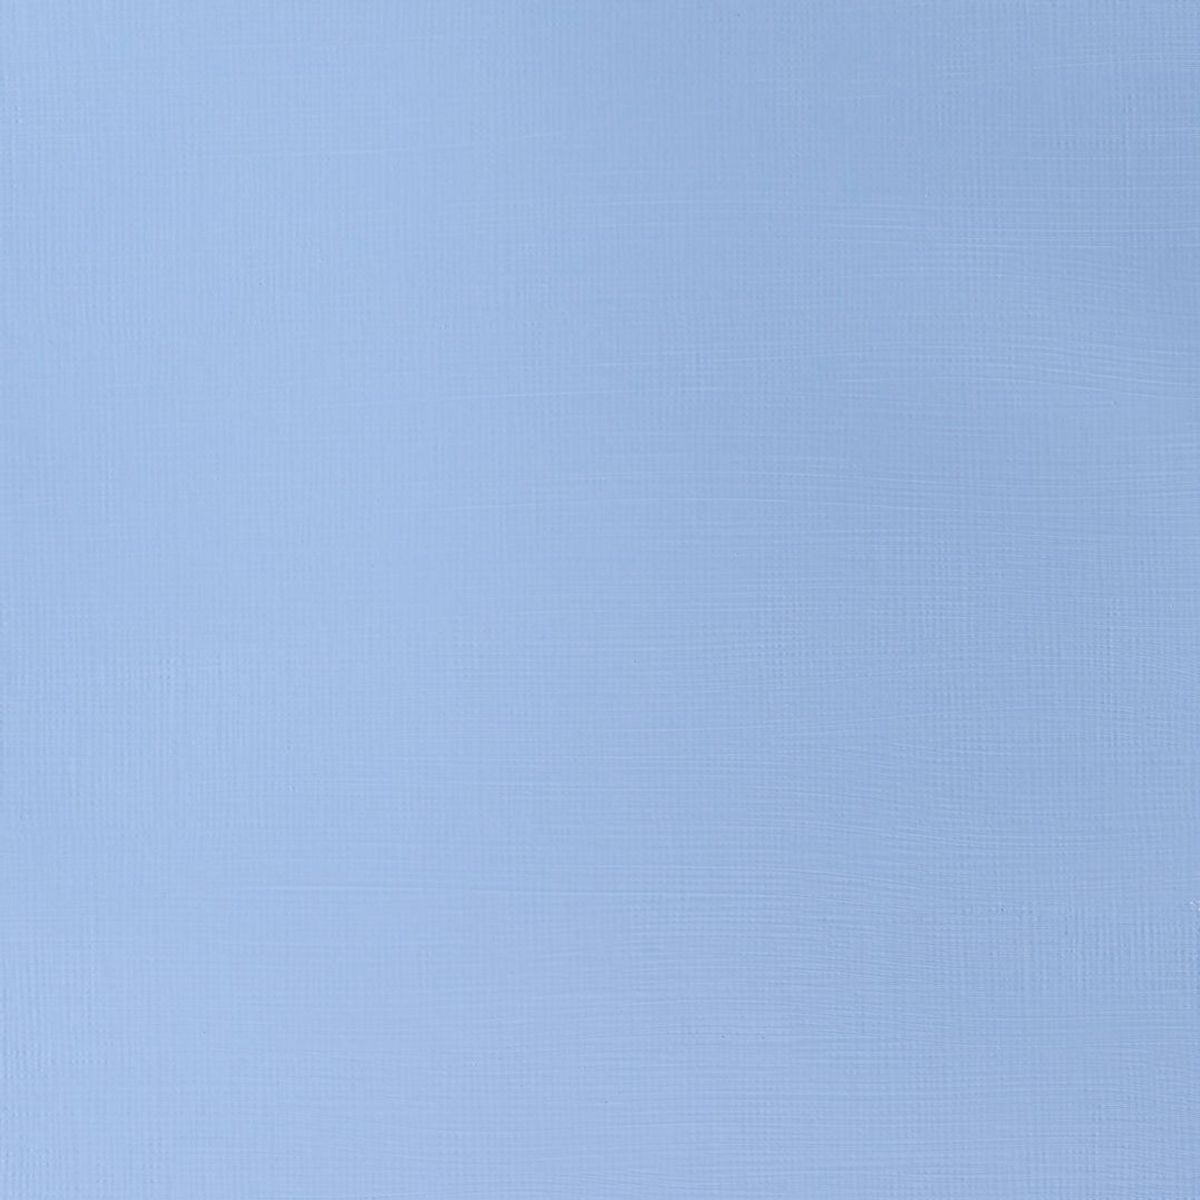 WINSOR AND NEWTON GALERIA ACRYLIC COLOUR - TUBE OF 60 ML - POWDER BLUE (446)